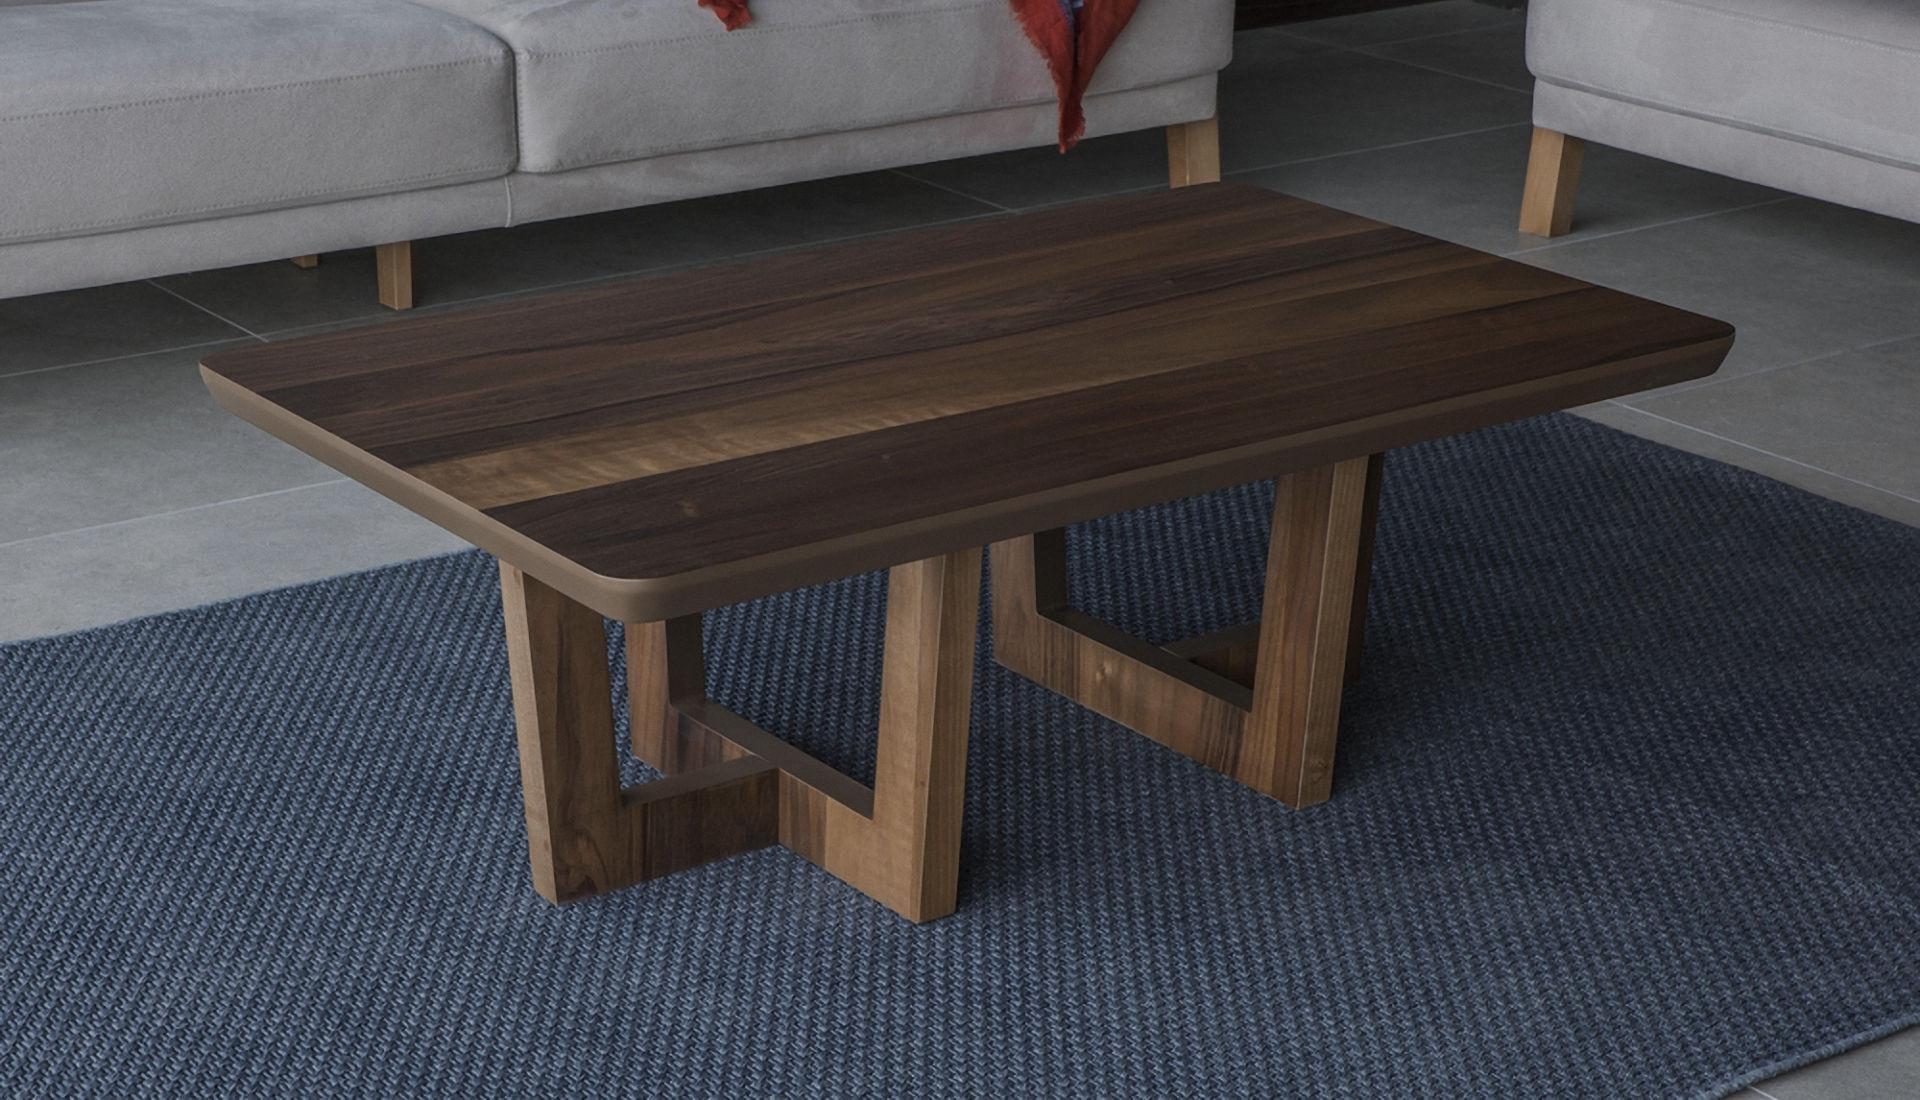 Tavolini mobilifici riuniti busiol brugnera pordenone for Brugnera mobili